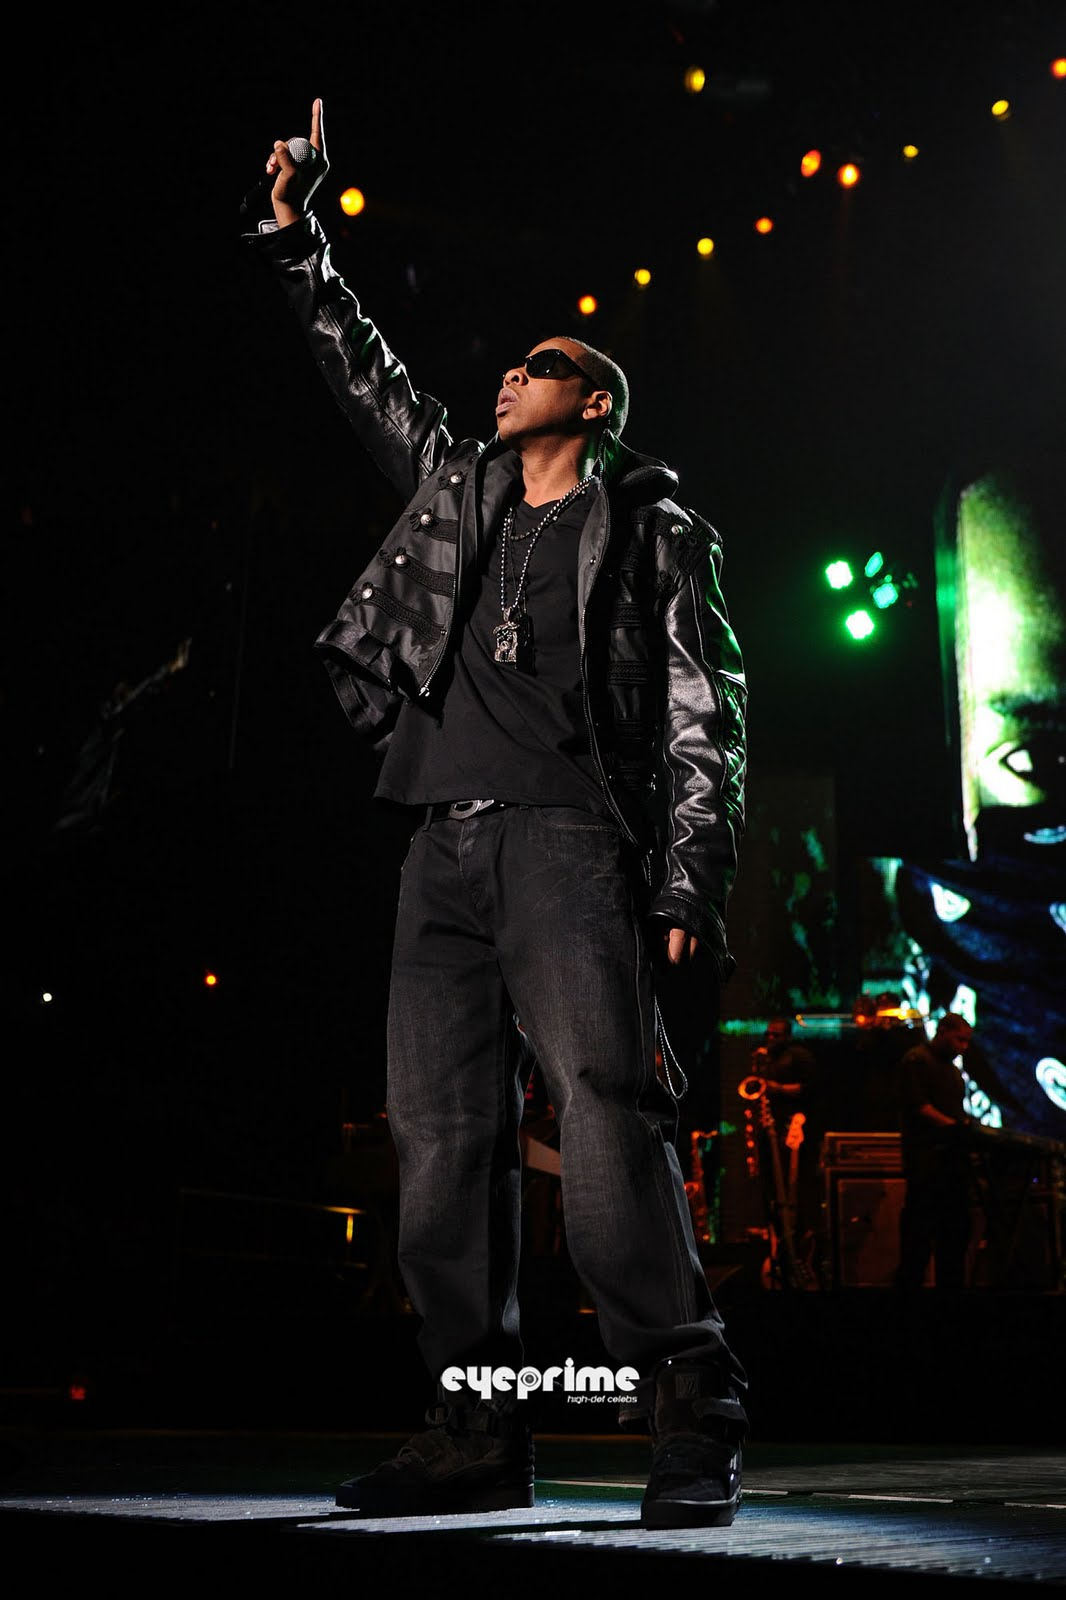 http://4.bp.blogspot.com/_6A8j2EQmANk/S8biVfJihII/AAAAAAAABco/gBAeNkKJbhQ/s1600/Jay-Z3.jpg